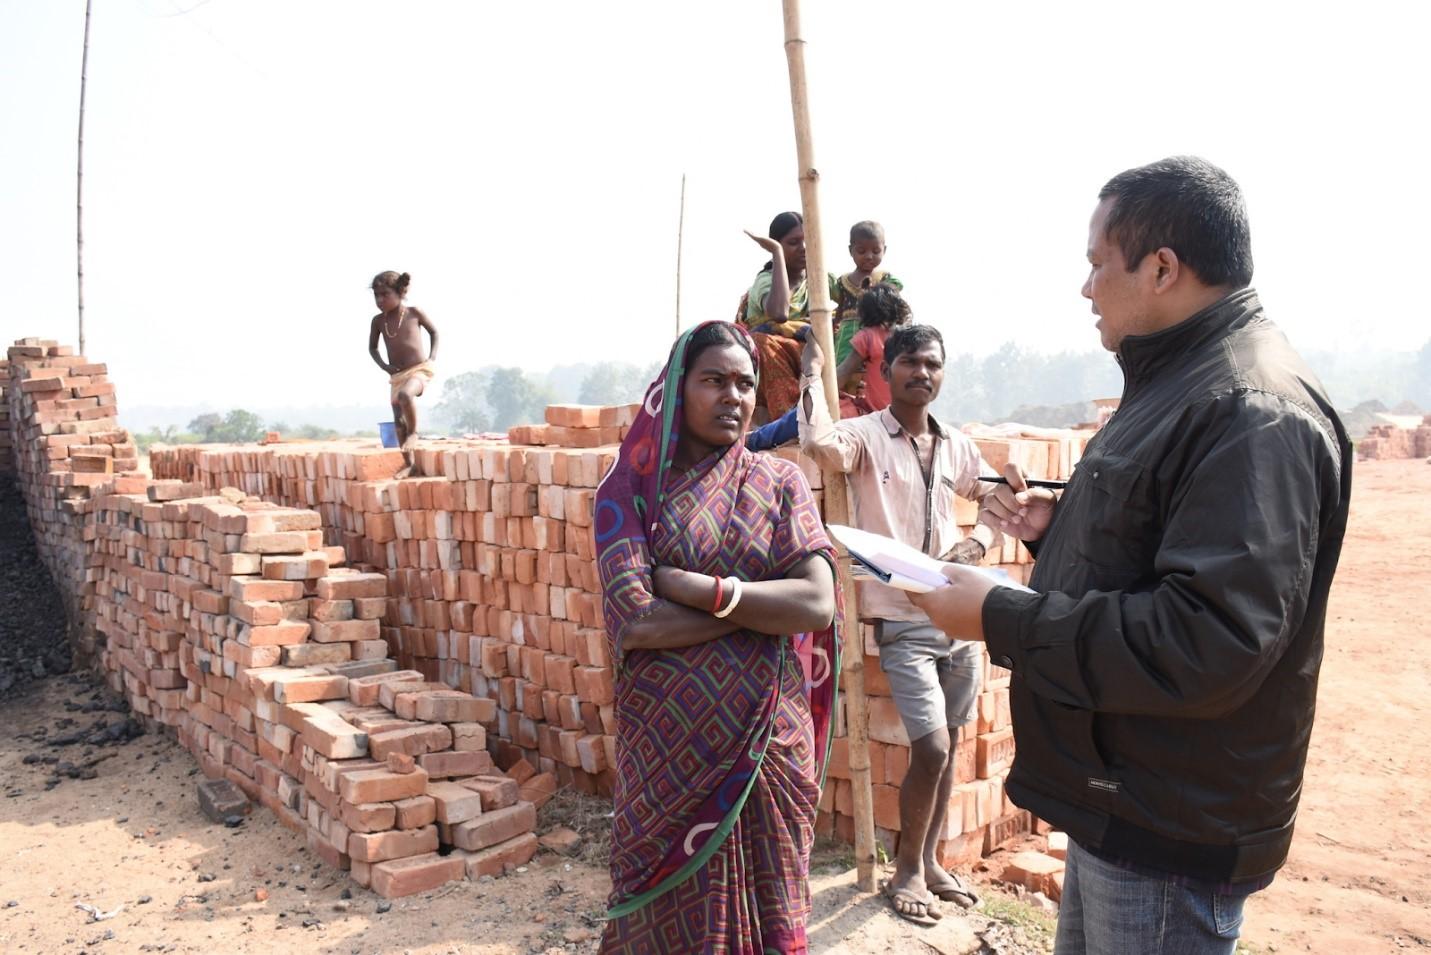 Photo 2: Evidence Action India team member, Sanjoy Yumnam talks to Guddi at the brick kiln in Jirania, West Tripura